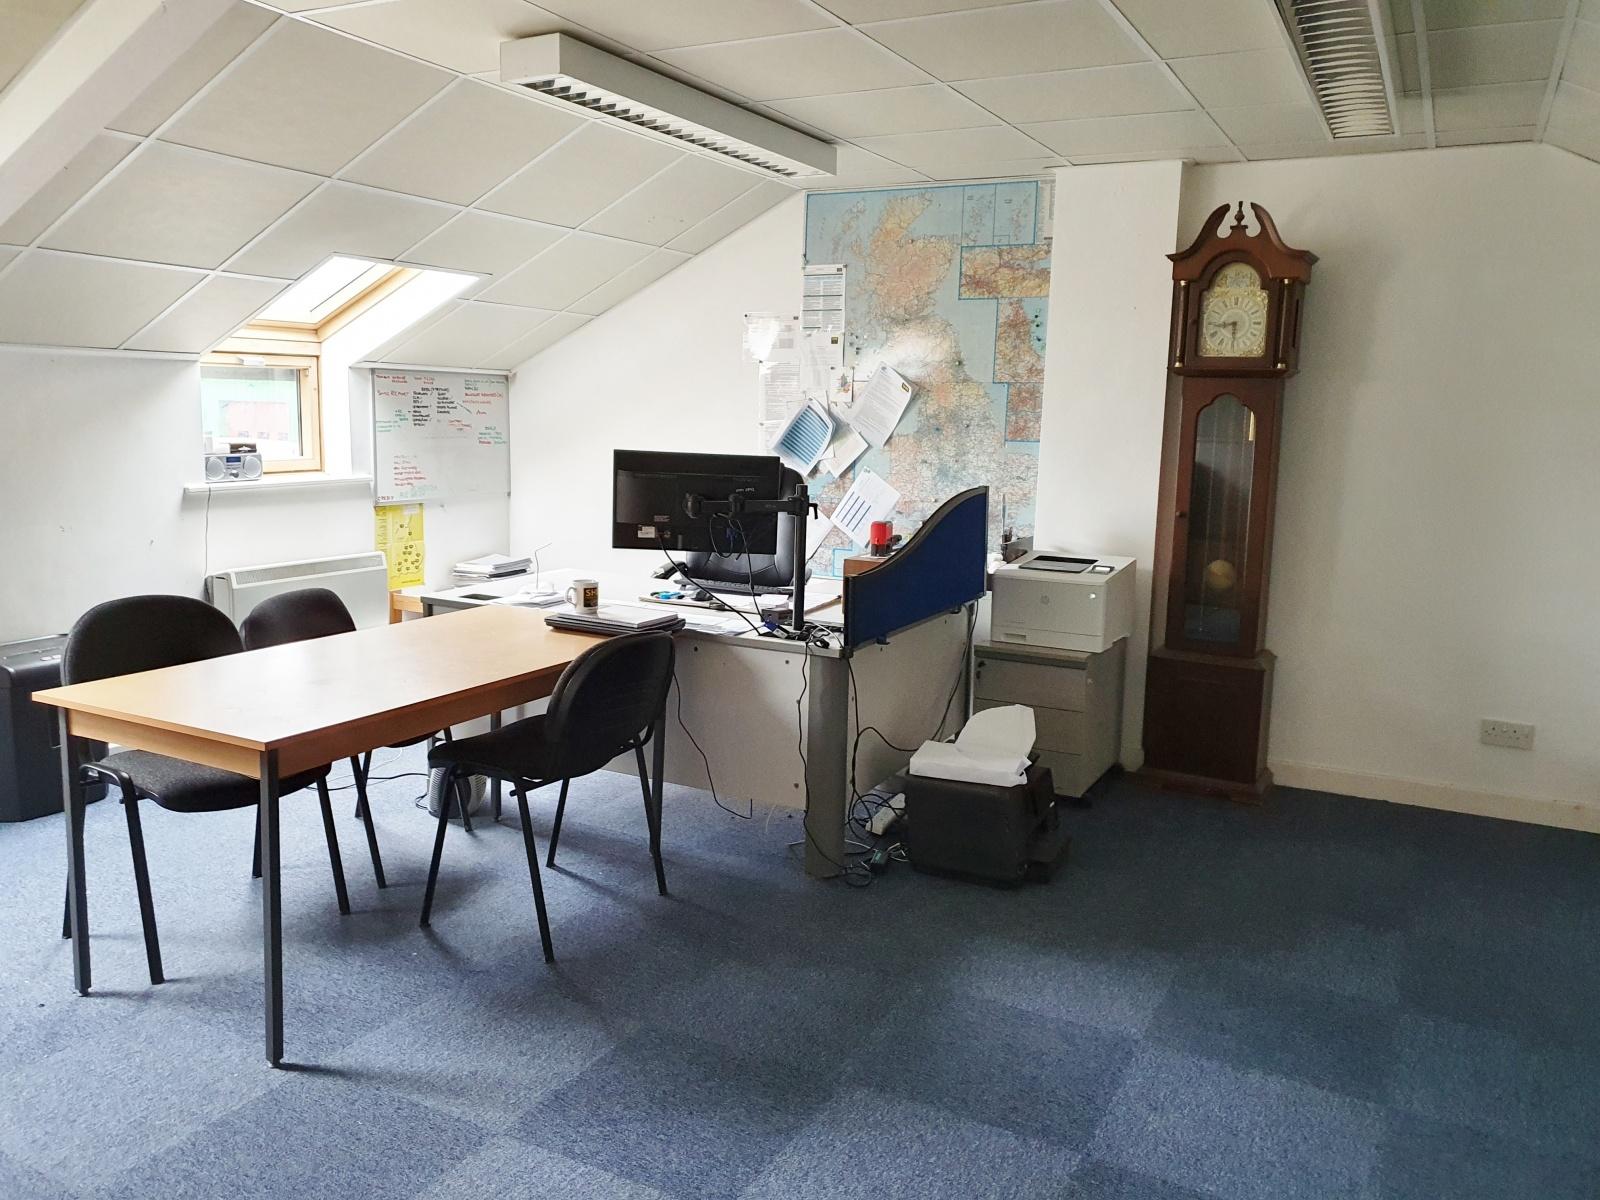 Unit 6, Bicton Business Park, Isle Lane, Bicton, Nr. Shrewsbury, Shropshire